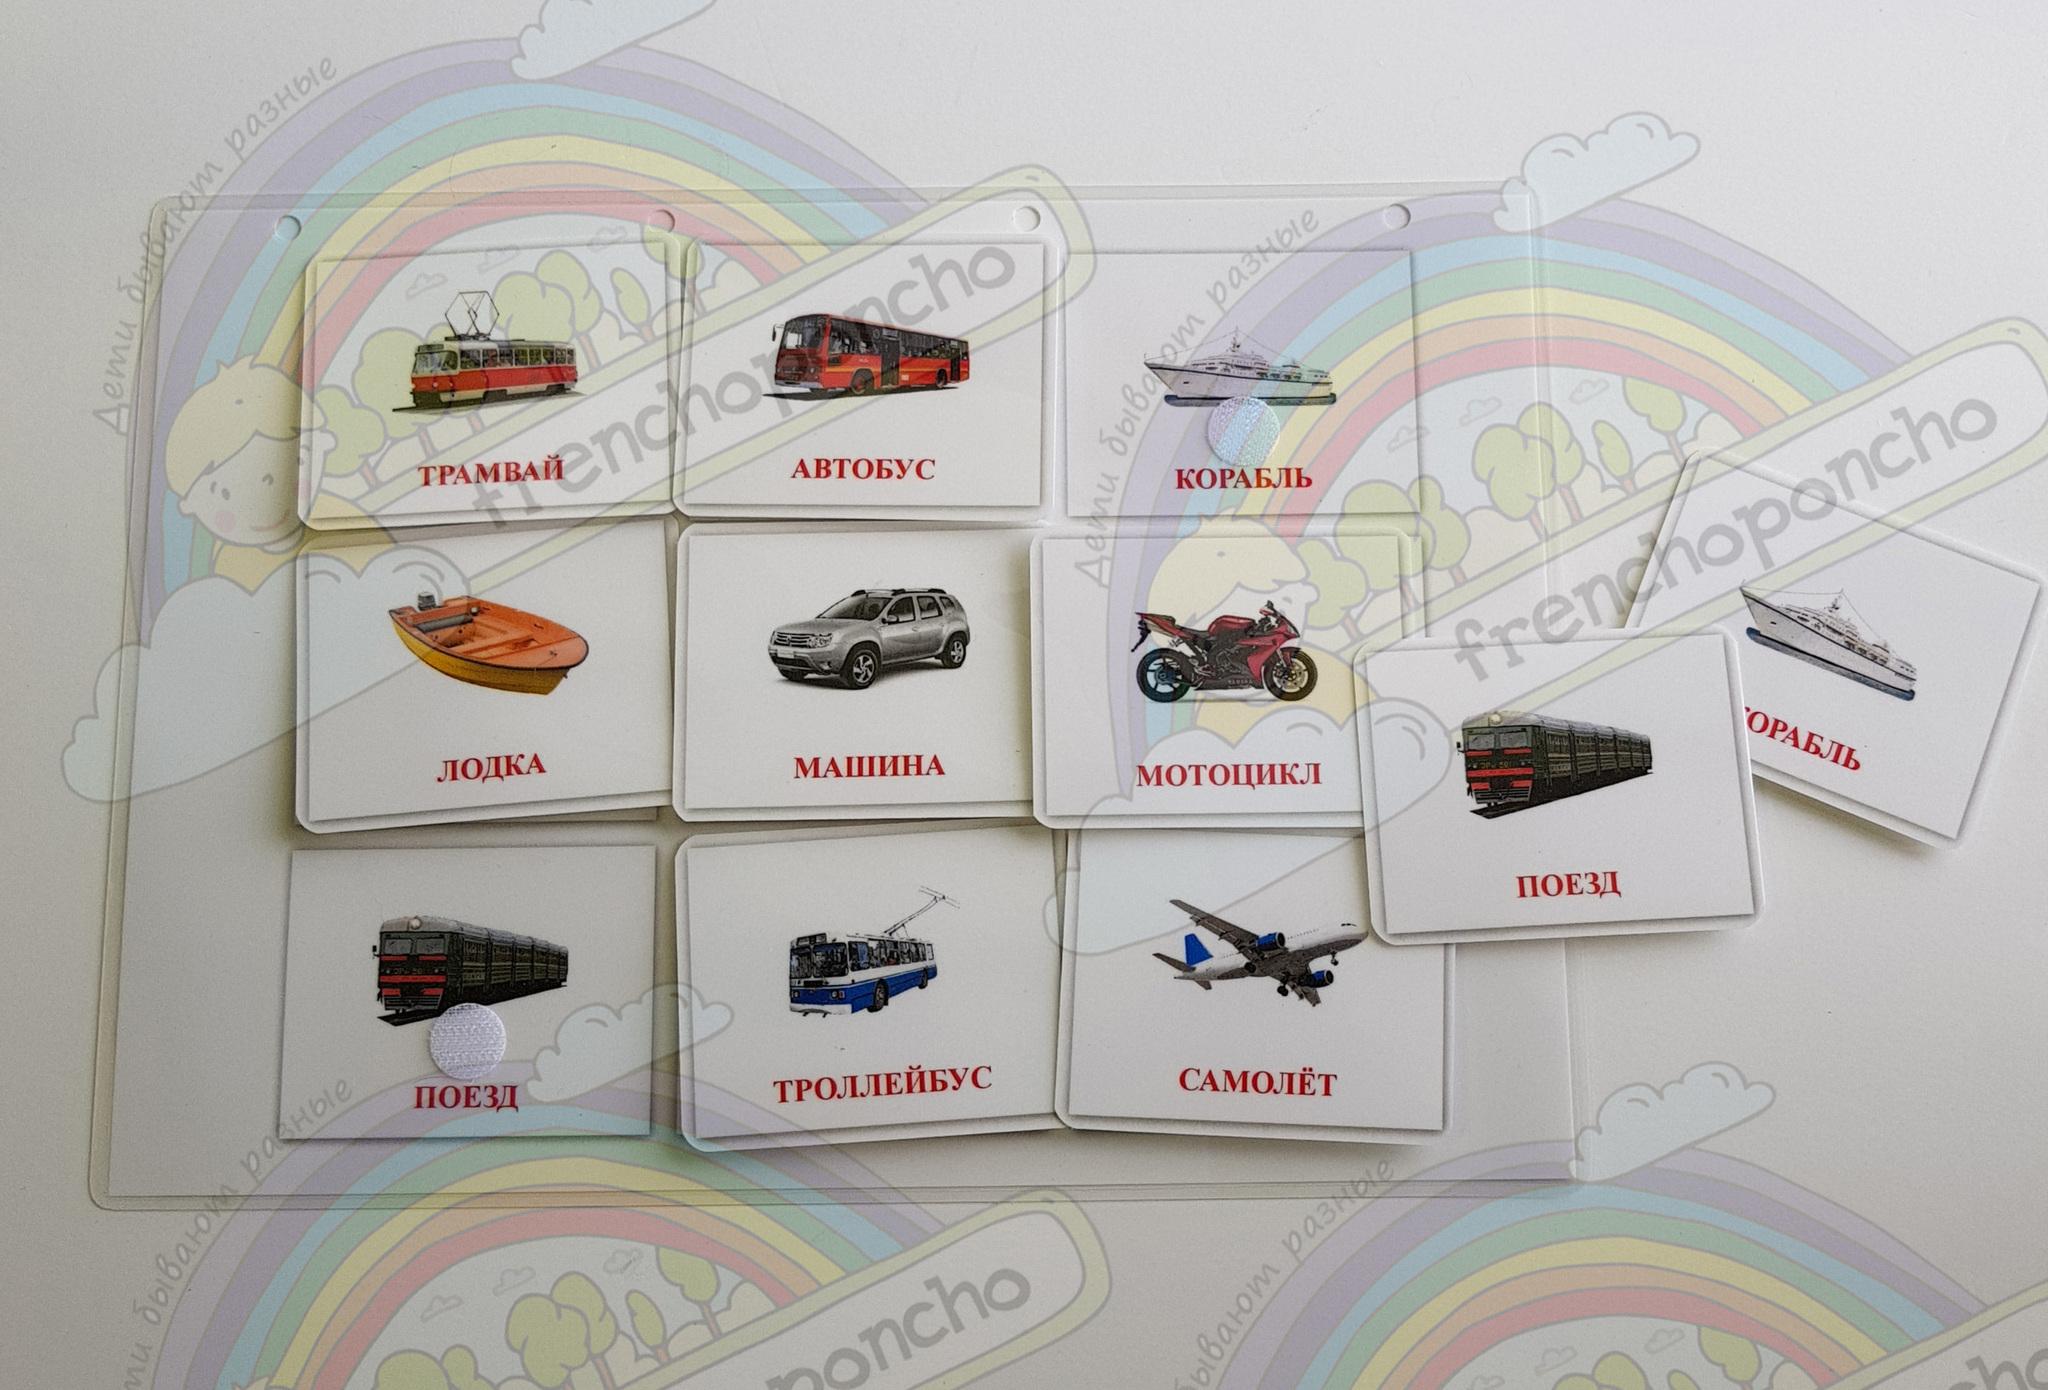 Транспорт. 9 карточек. Развивающие пособия на липучках Frenchoponcho (Френчопончо)